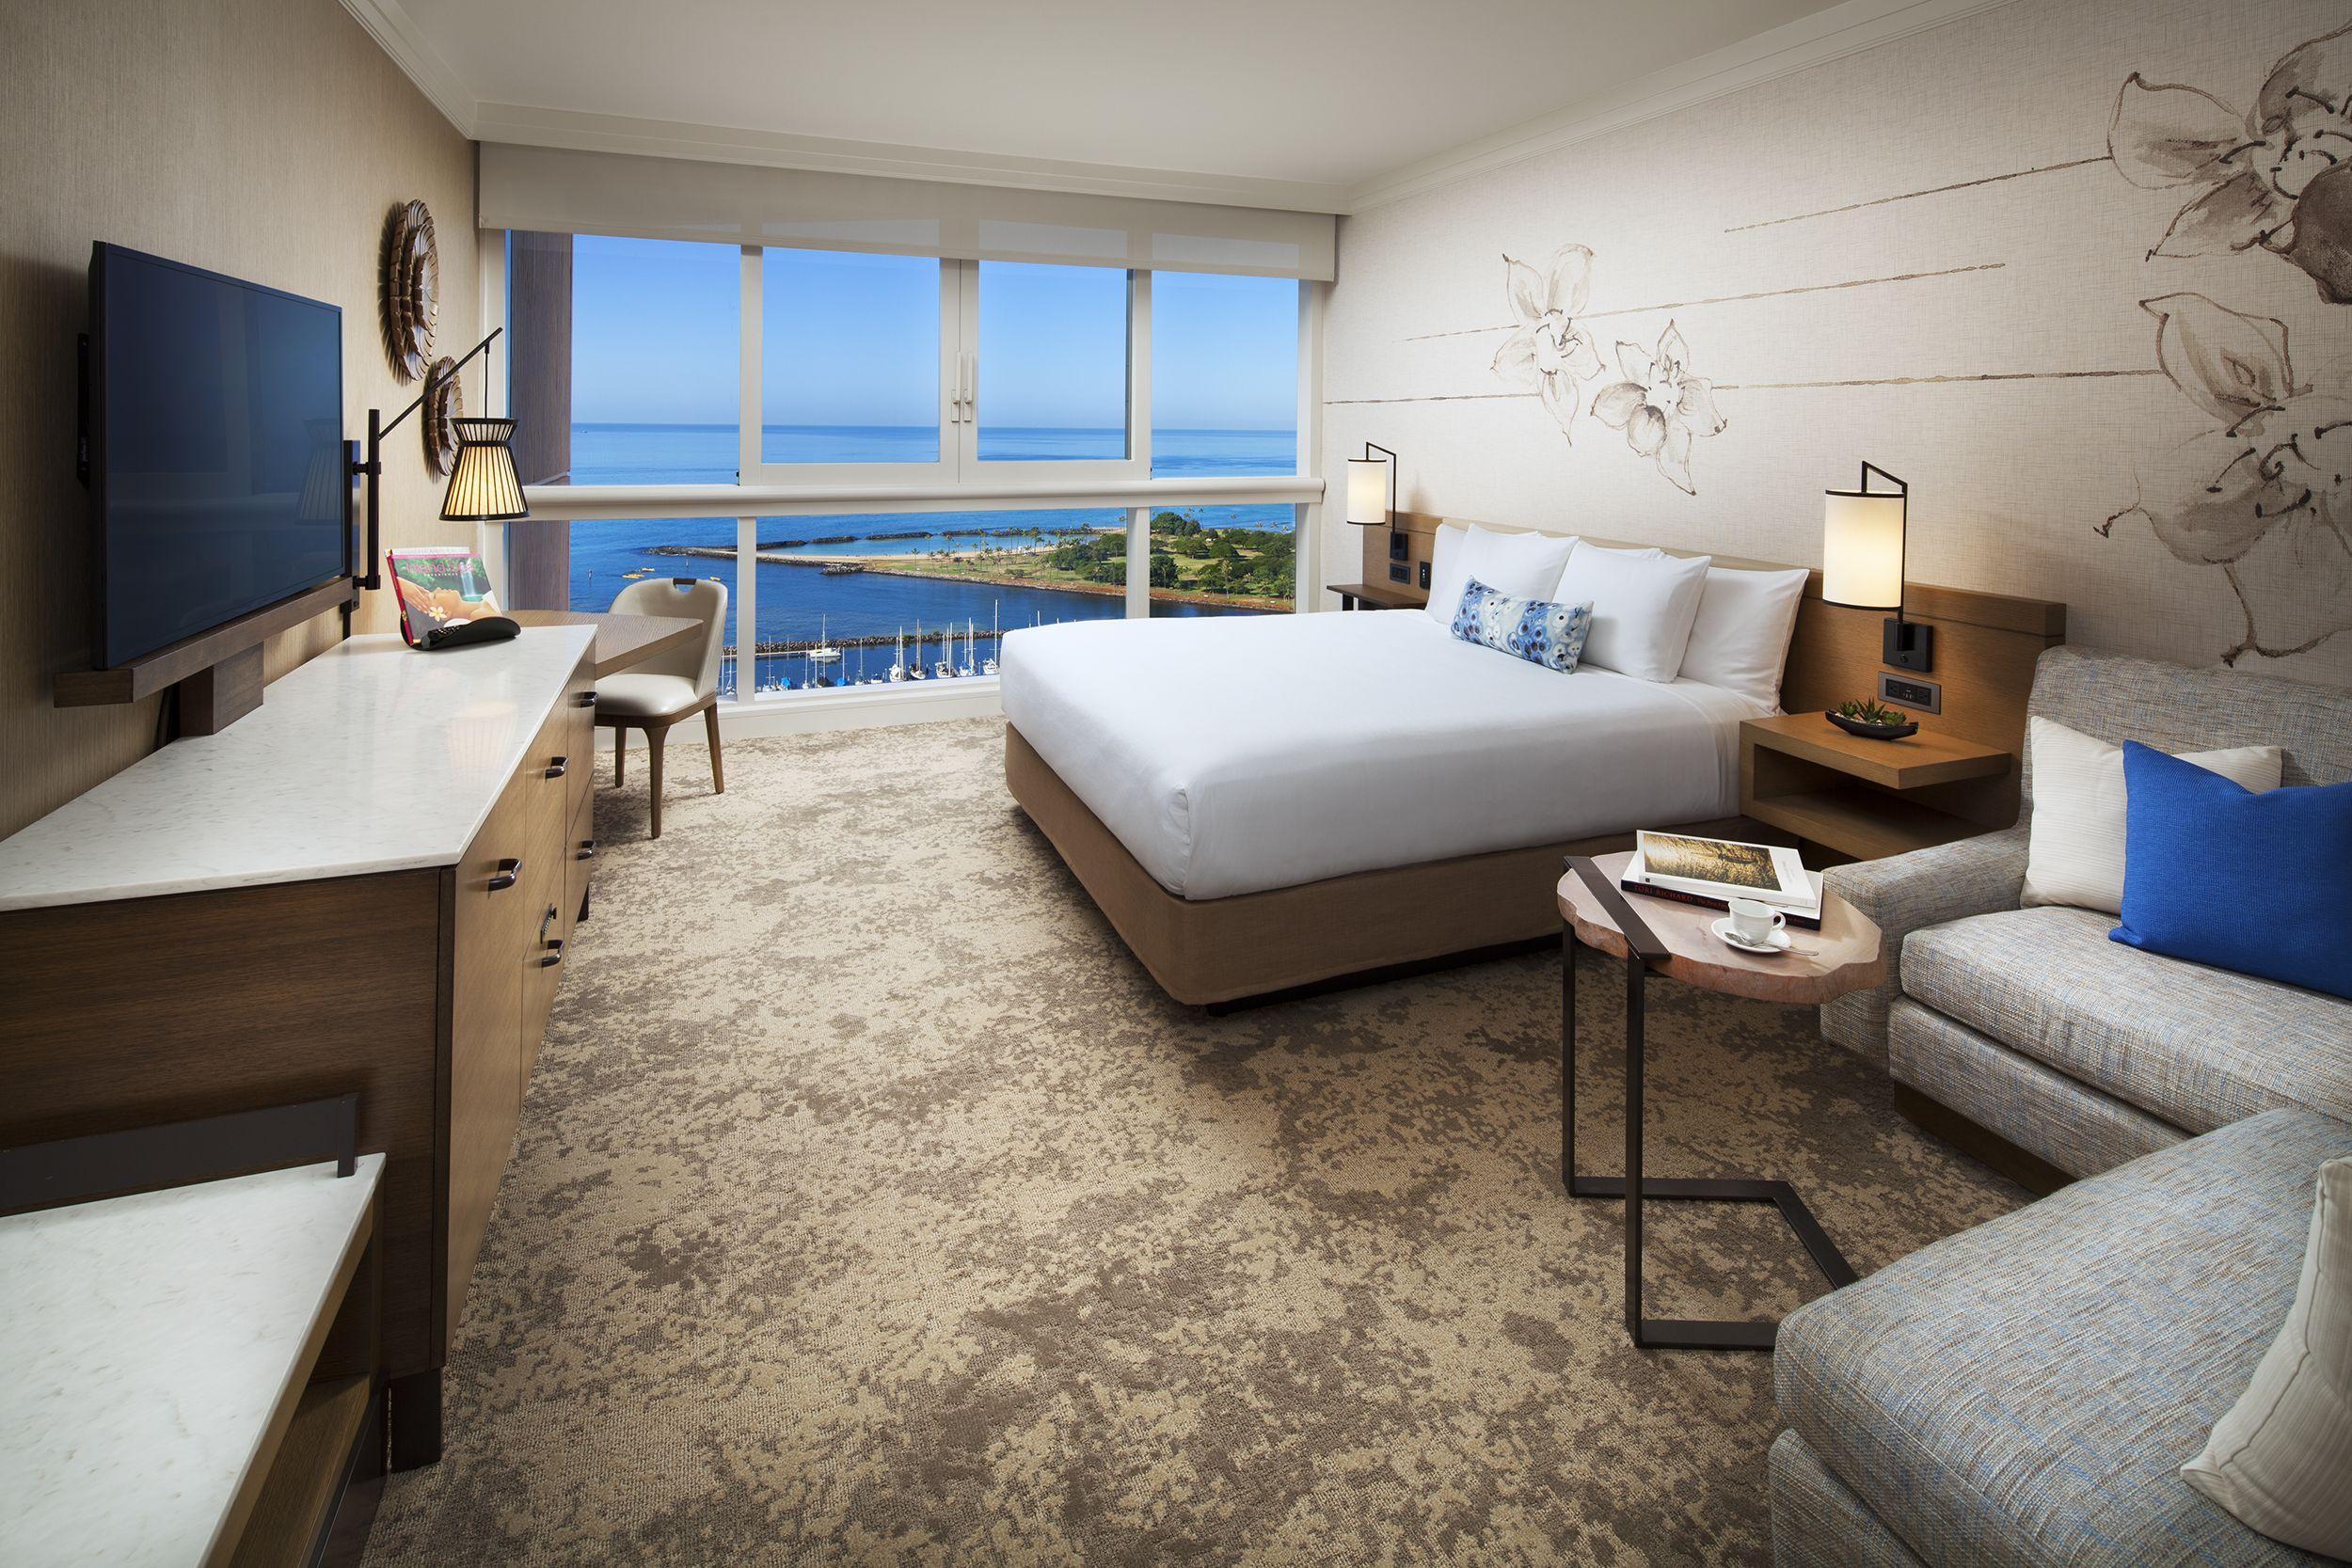 Ocean Front Premier Room Prince Waikiki Prince Waikiki Hotel Waikiki Hotels Luxury Hotel